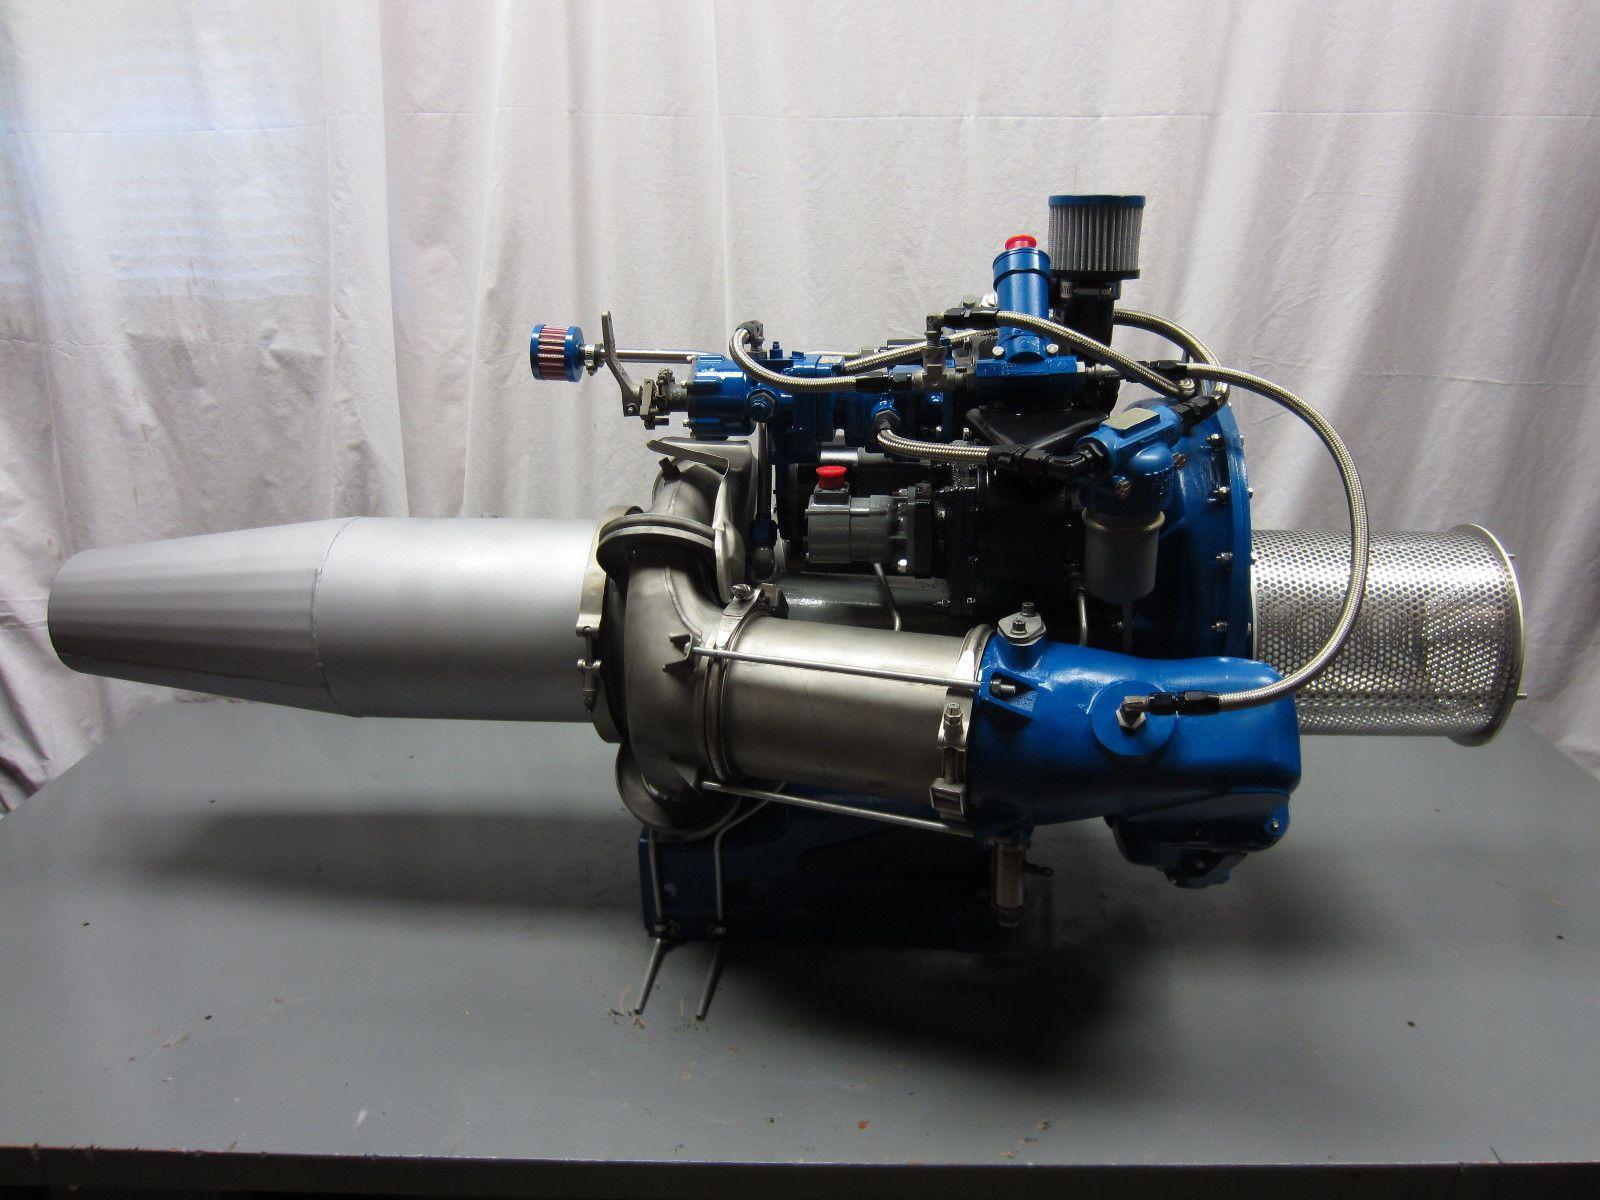 Boeing Gas Turbine Jet Engine Turbojet 502 | Boeing aircraft and